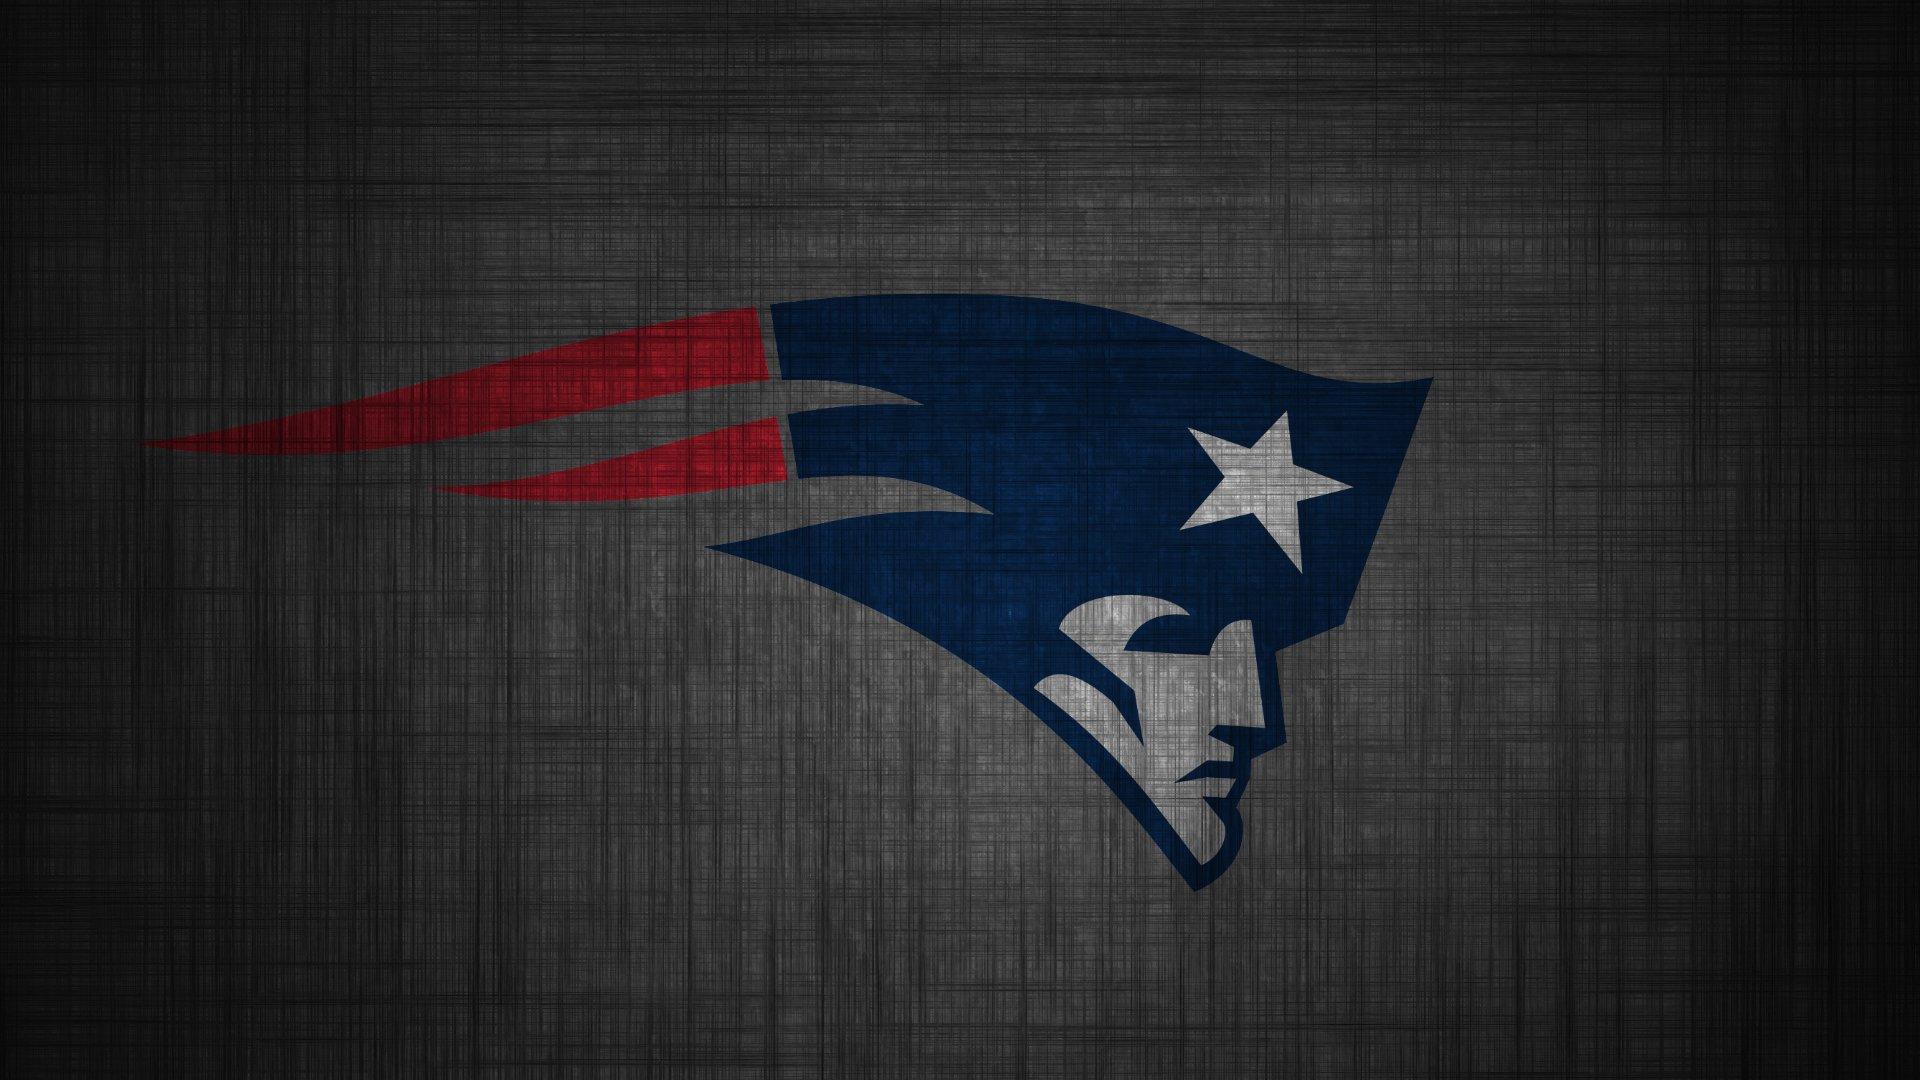 New England Patriots Logo Wallpaper 55965 1920x1080 Px